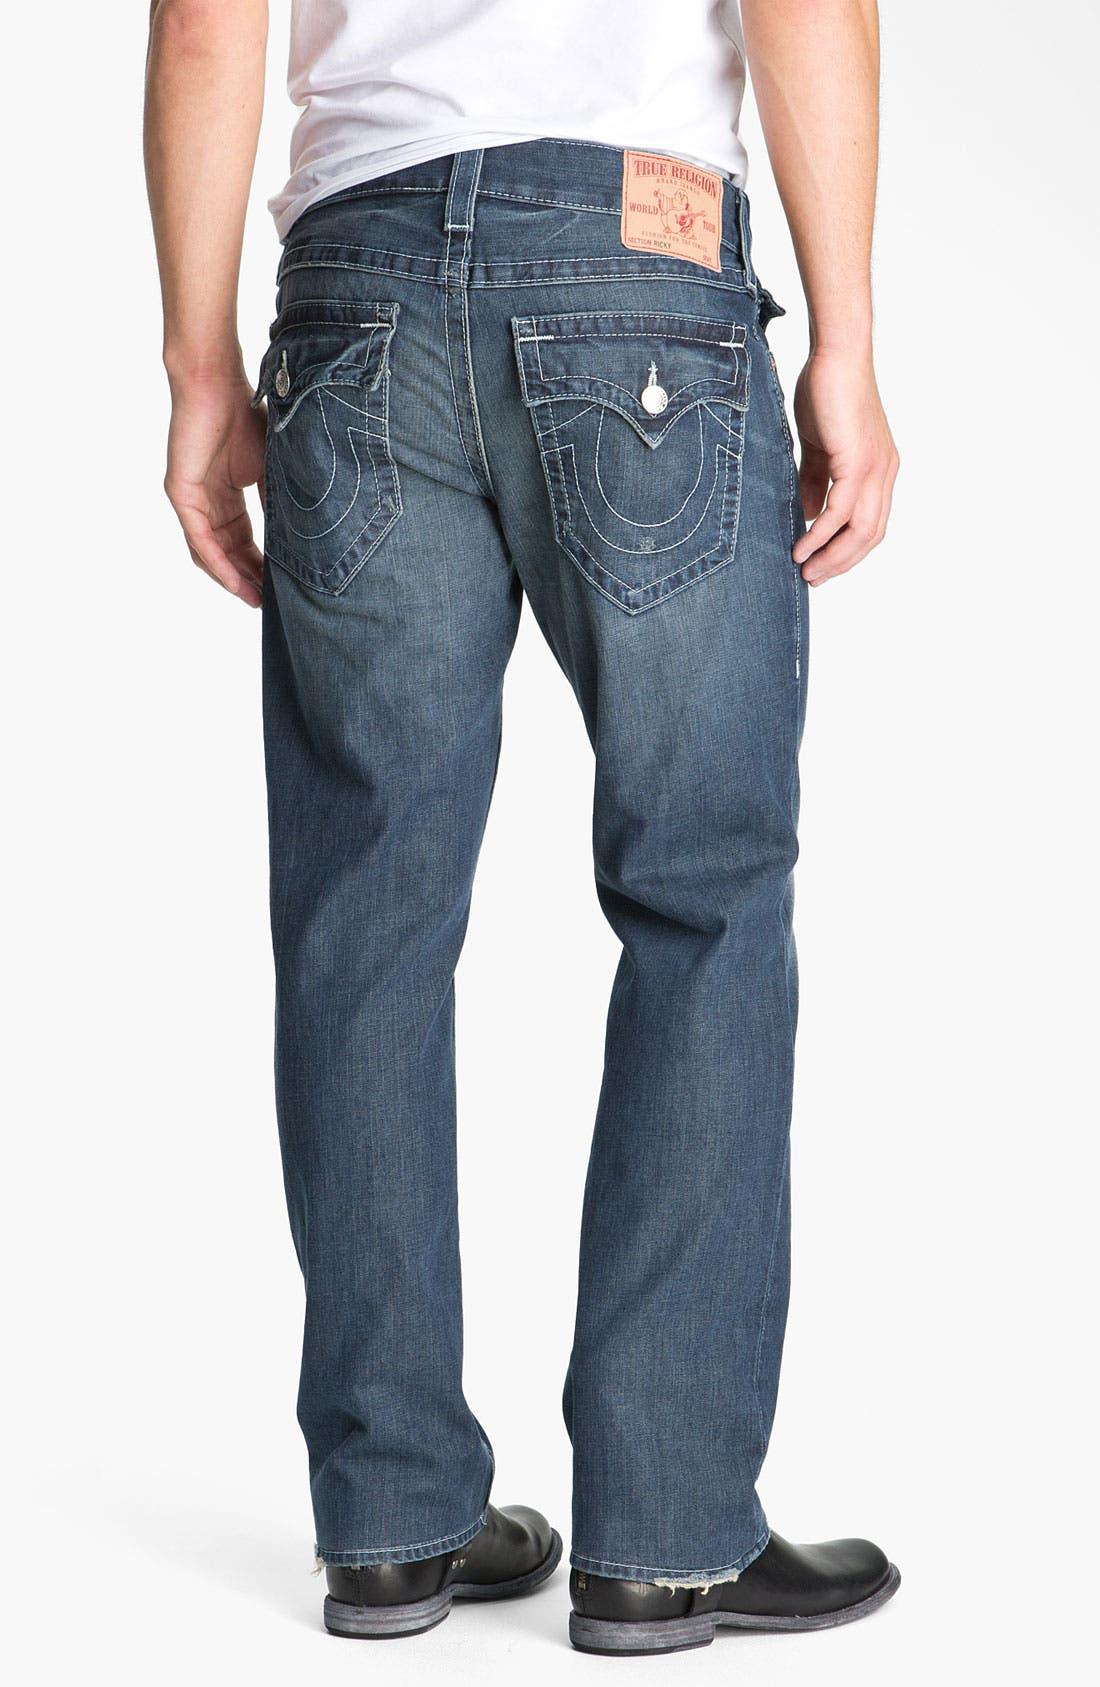 Alternate Image 1 Selected - True Religion Brand Jeans 'Ricky - Natural' Straight Leg Jeans (Surfer Dark)